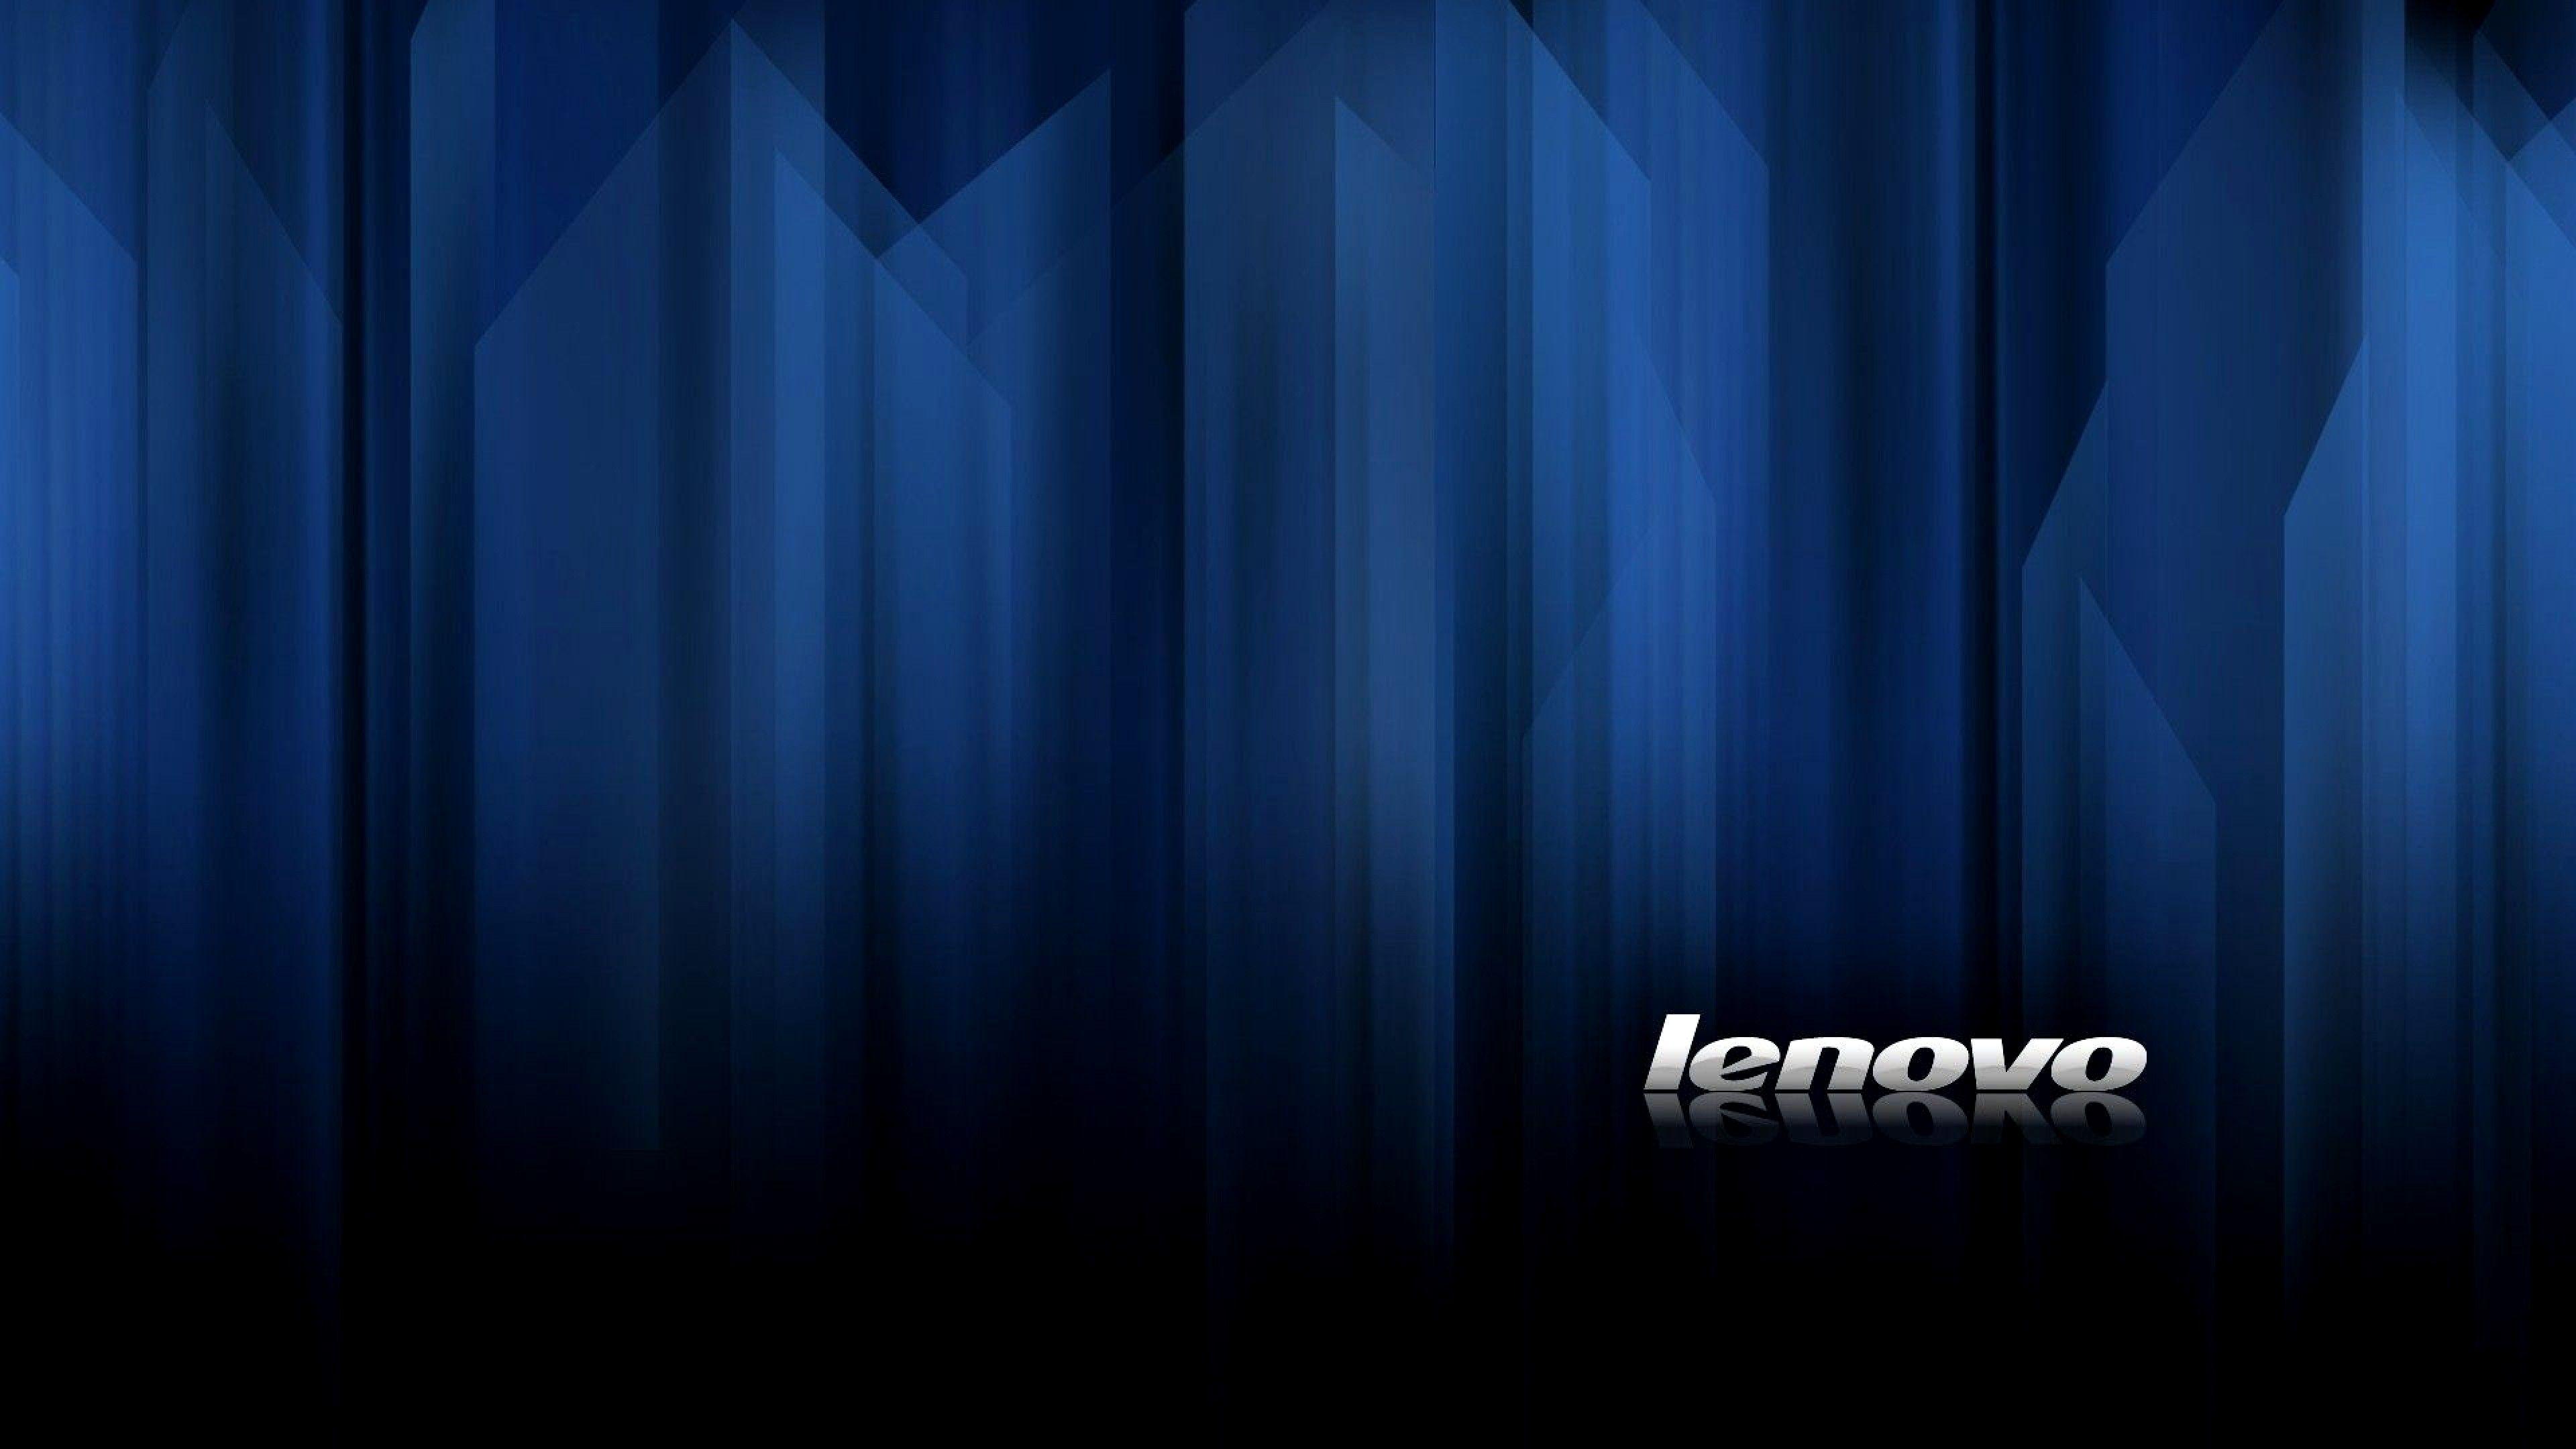 Wallpaper 4K Lenovo Trick Galaxy wallpaper, Gambar garis